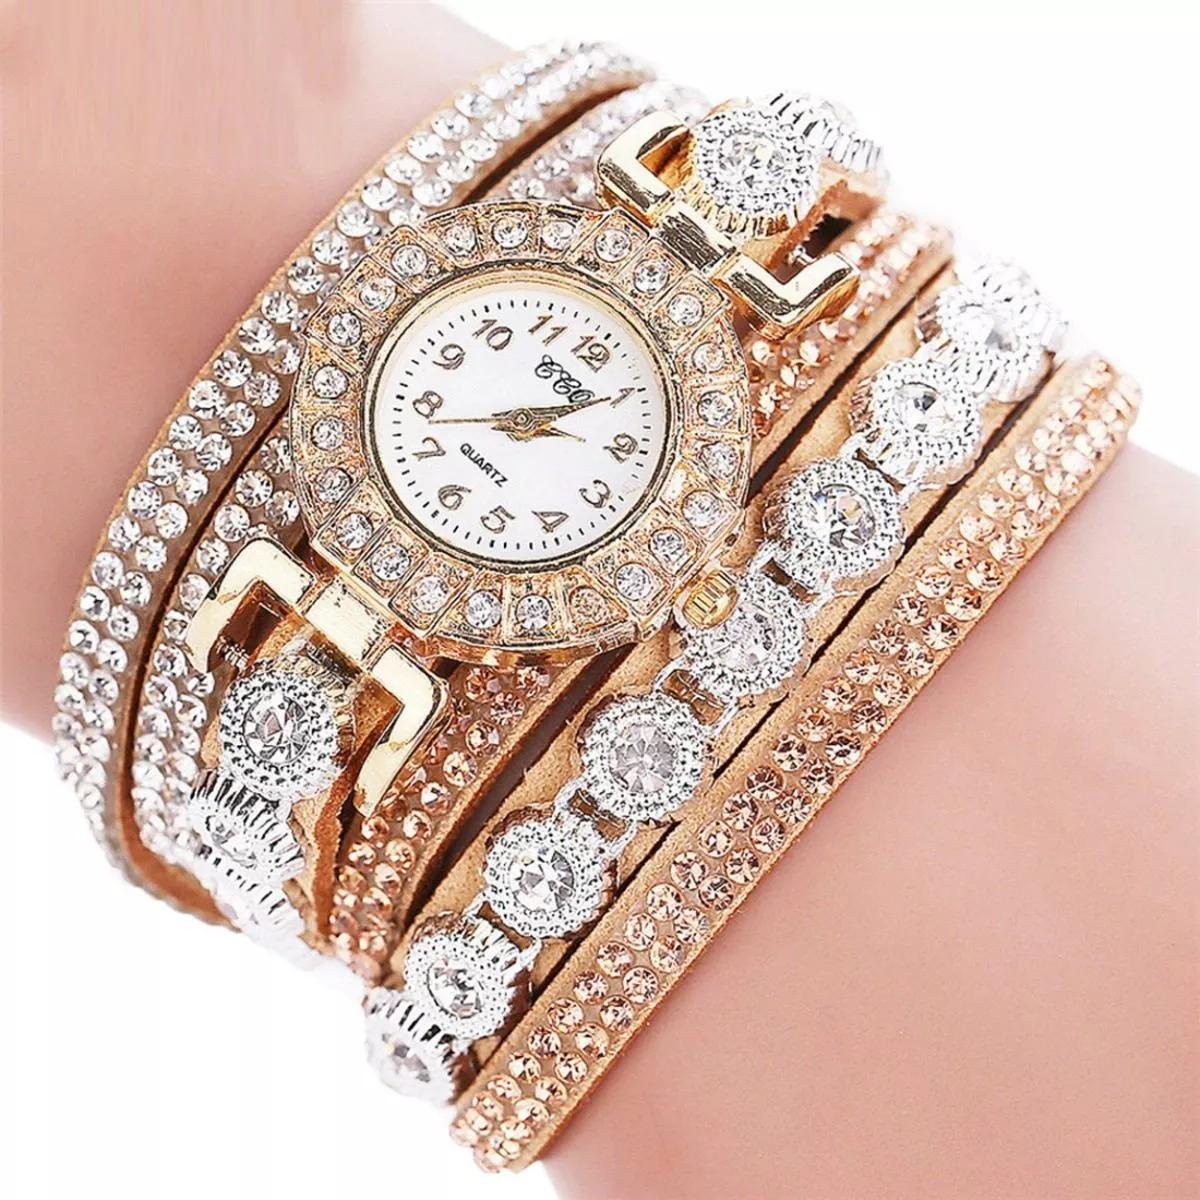 cb24b47f327 relogio feminino pulso pulseira bracelete strass brilhante. Carregando zoom.